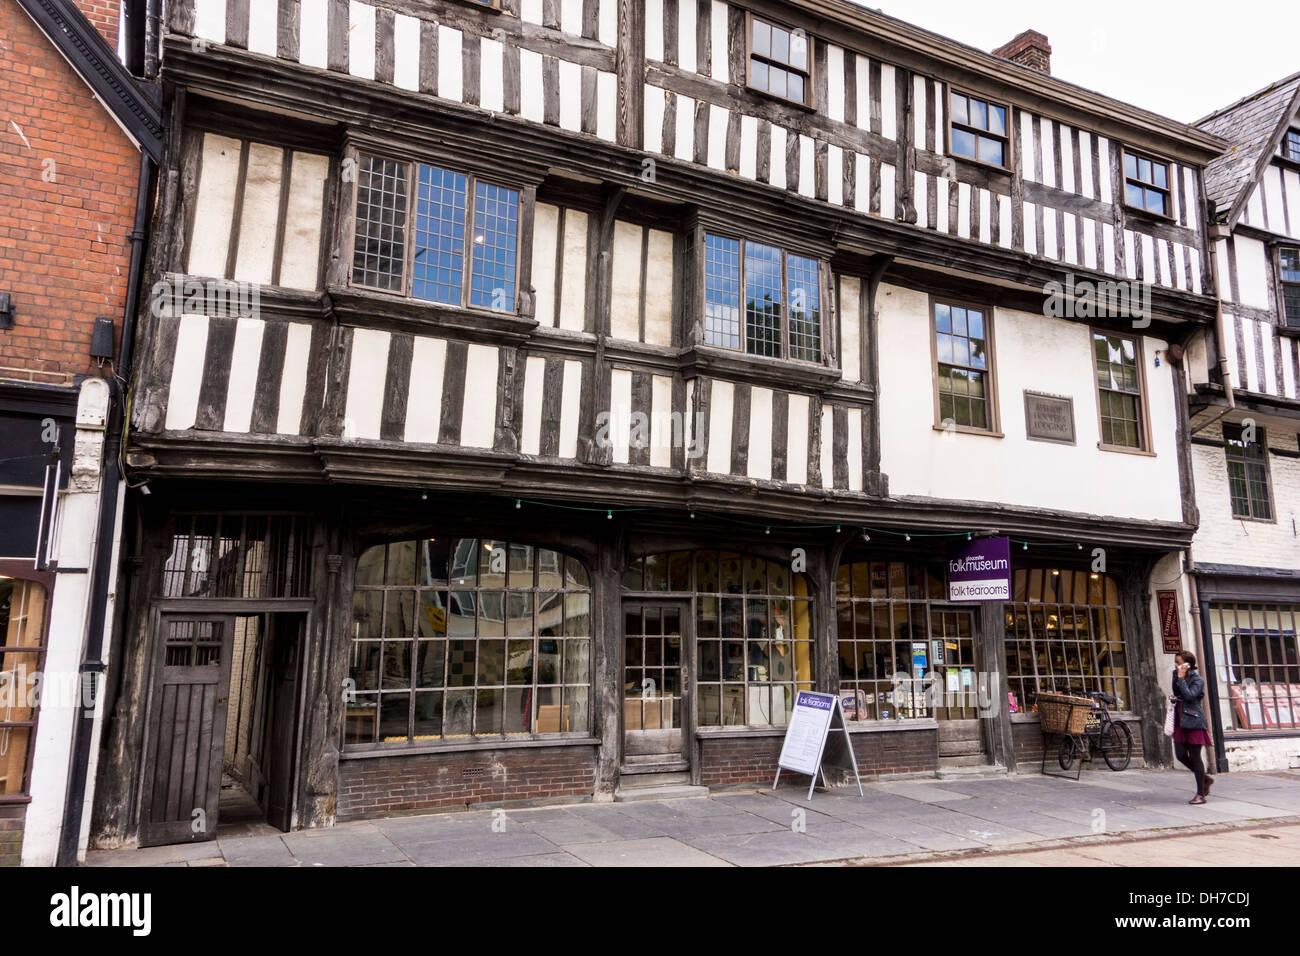 Folk Museum Tearooms in Gloucester, Gloucestershire, UK Stock Photo